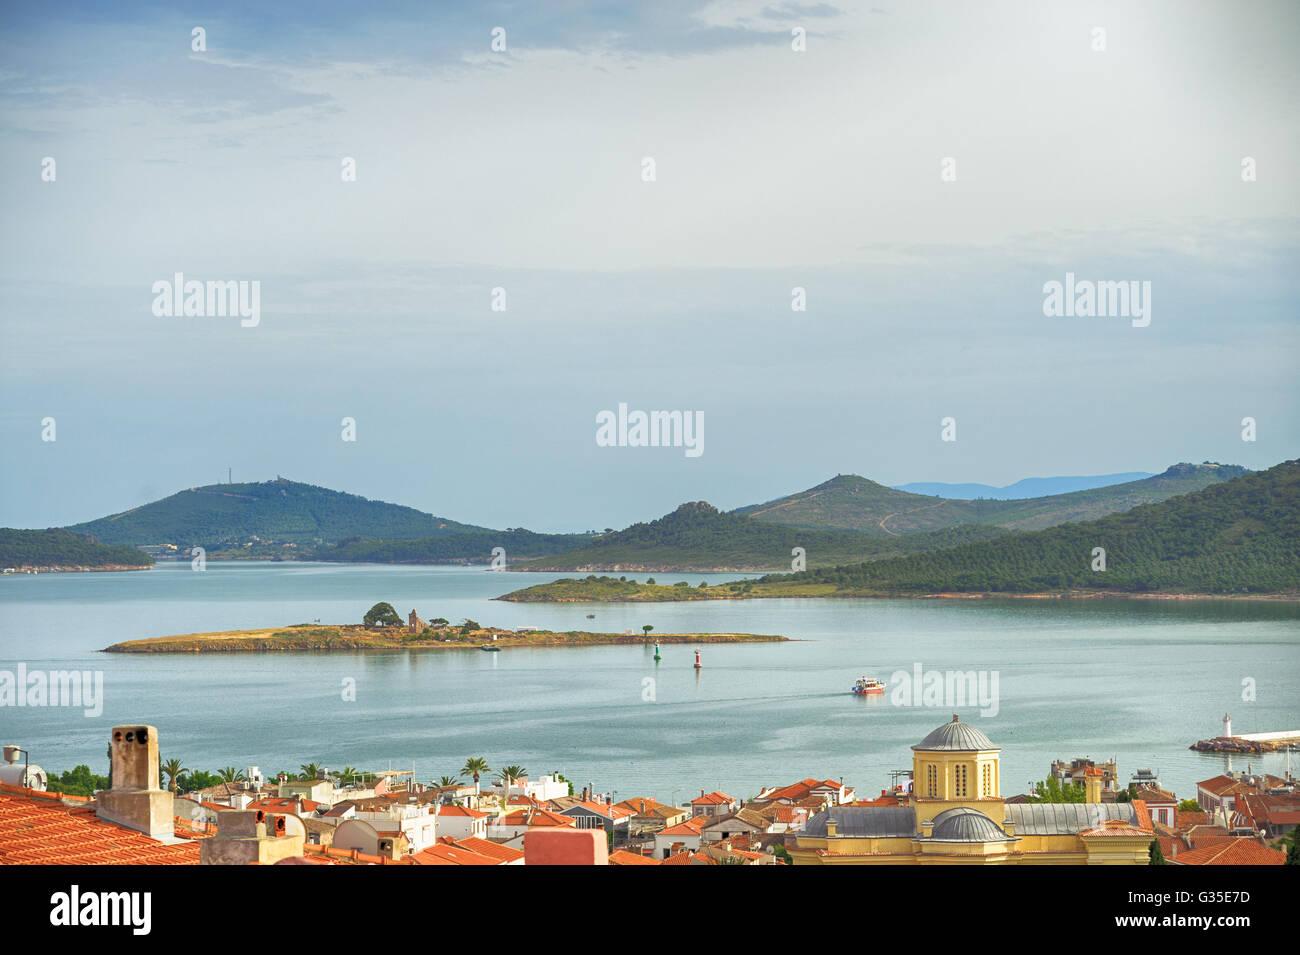 Seascape of touristic town, Cunda Alibey Island, Ayvalik. It is a small island in the northwestern Aegean Sea, - Stock Image